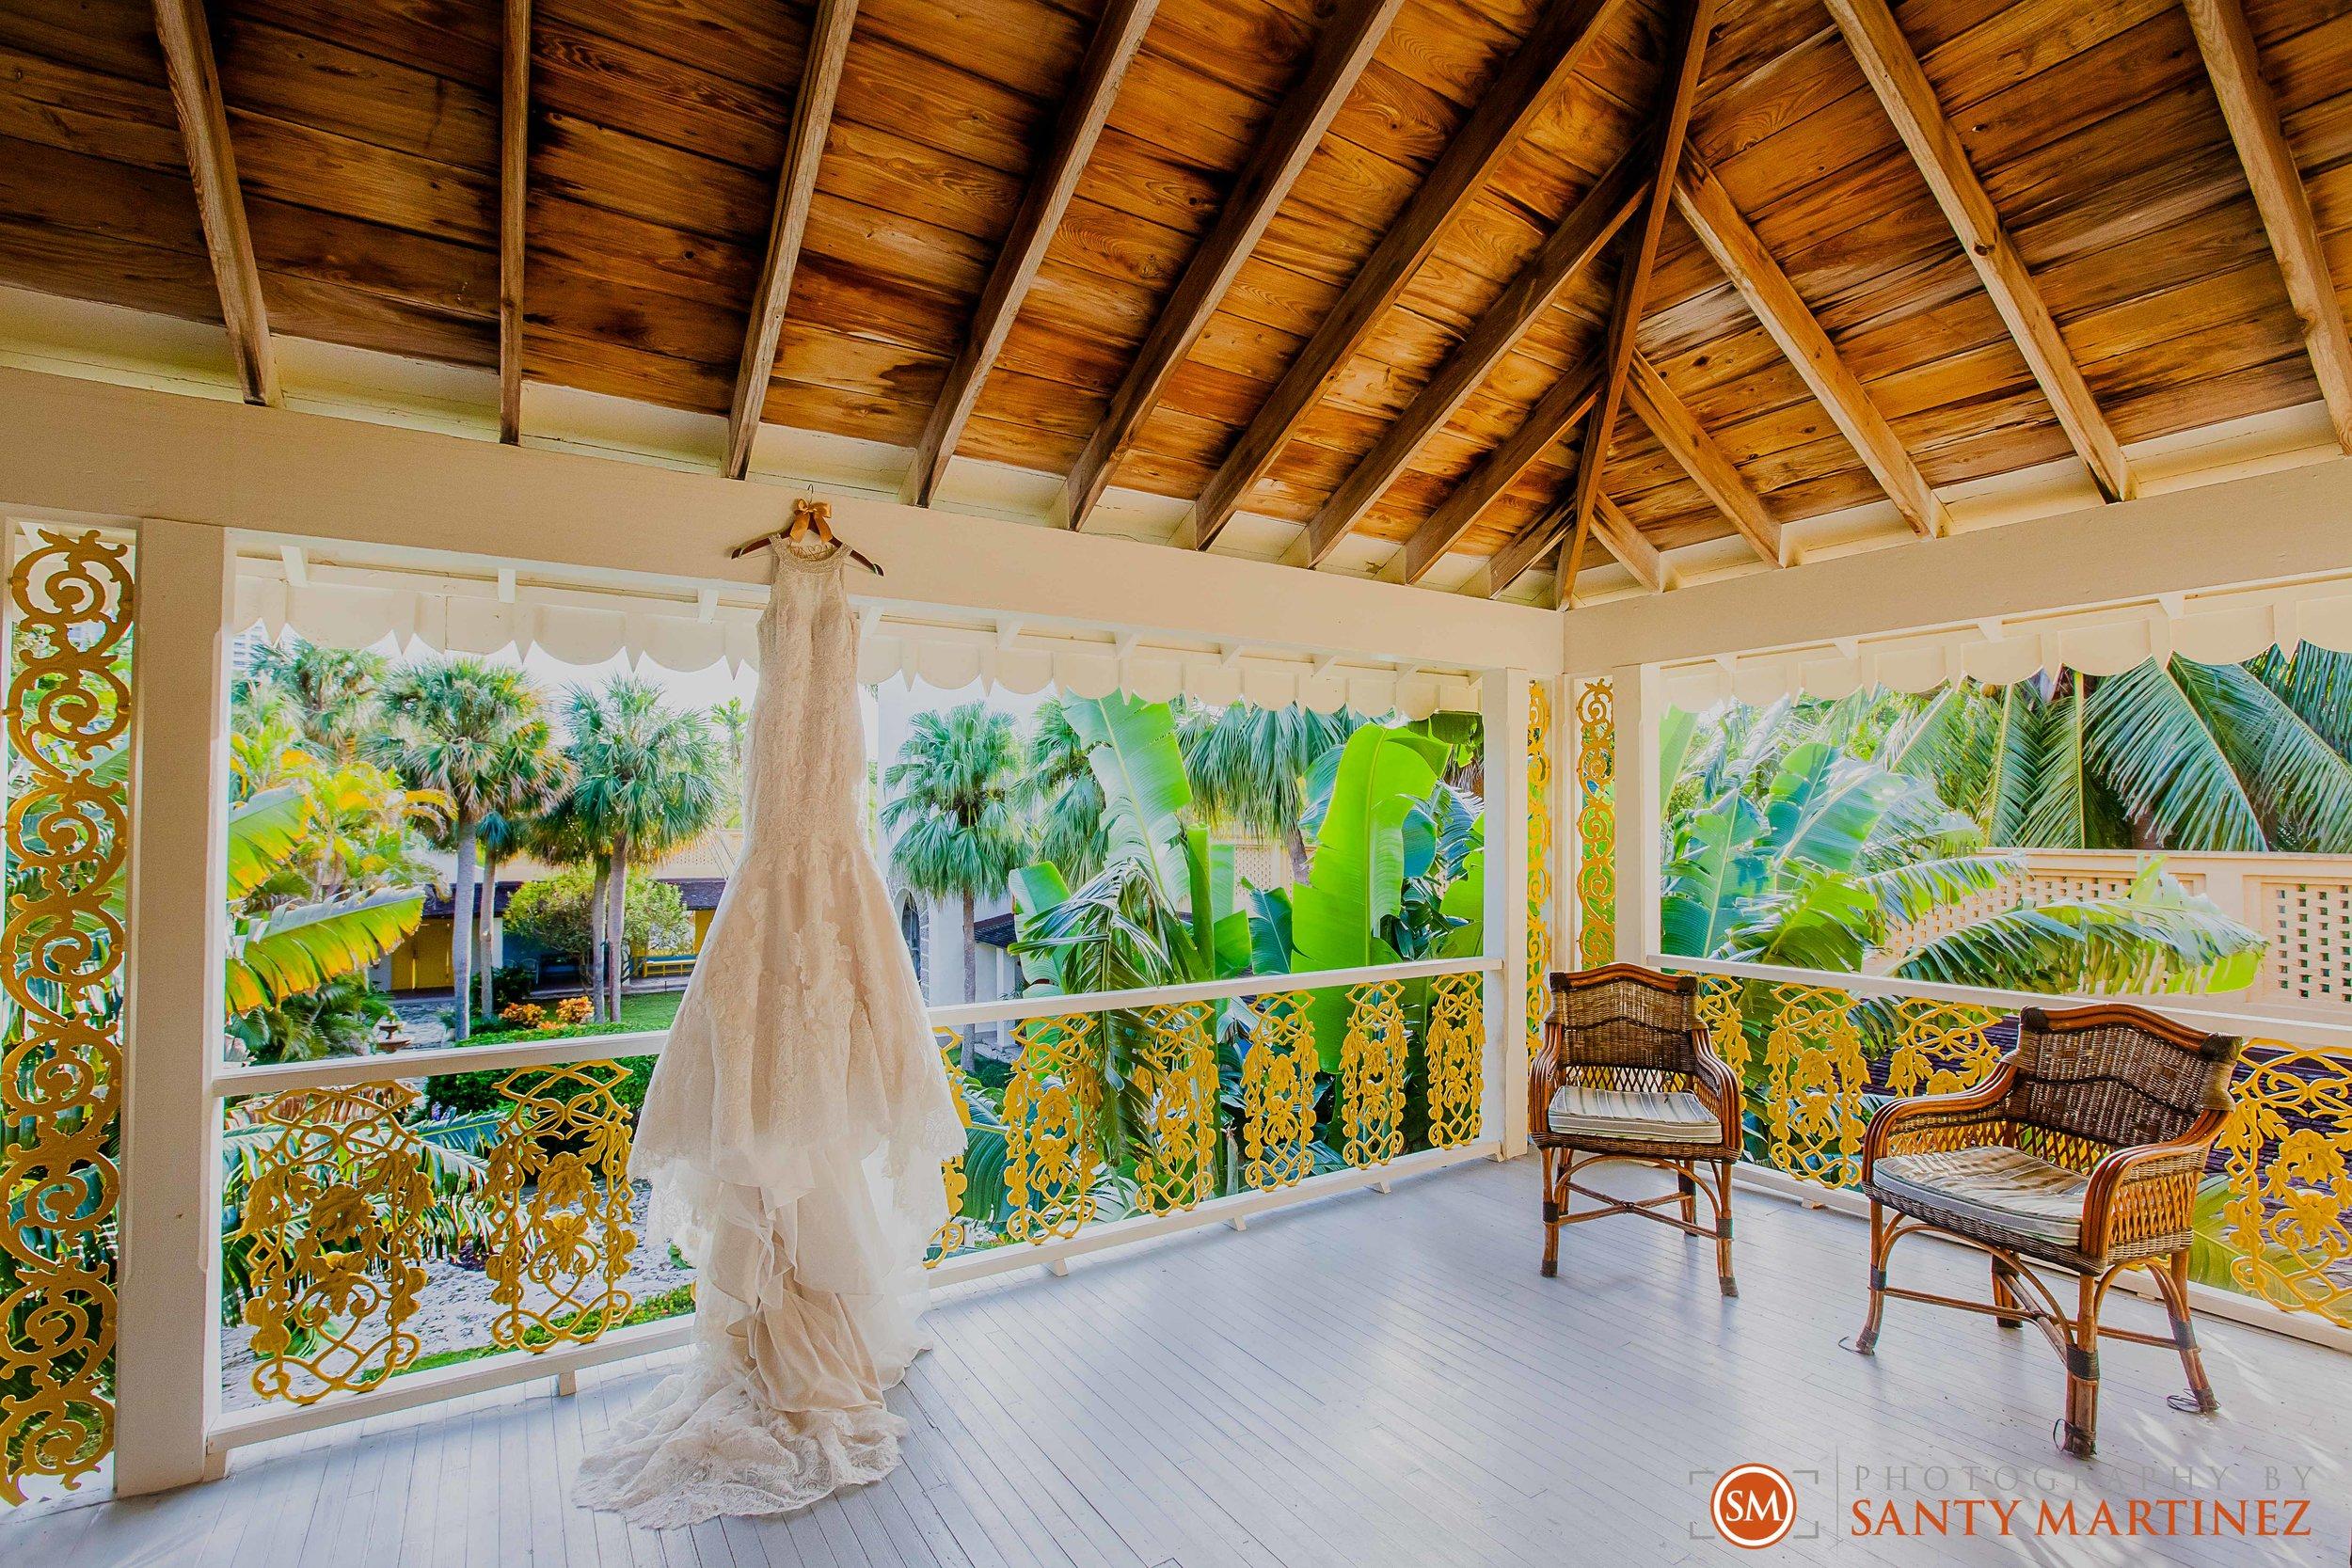 Wedding Bonnet House - Photography by Santy Martinez-1.jpg